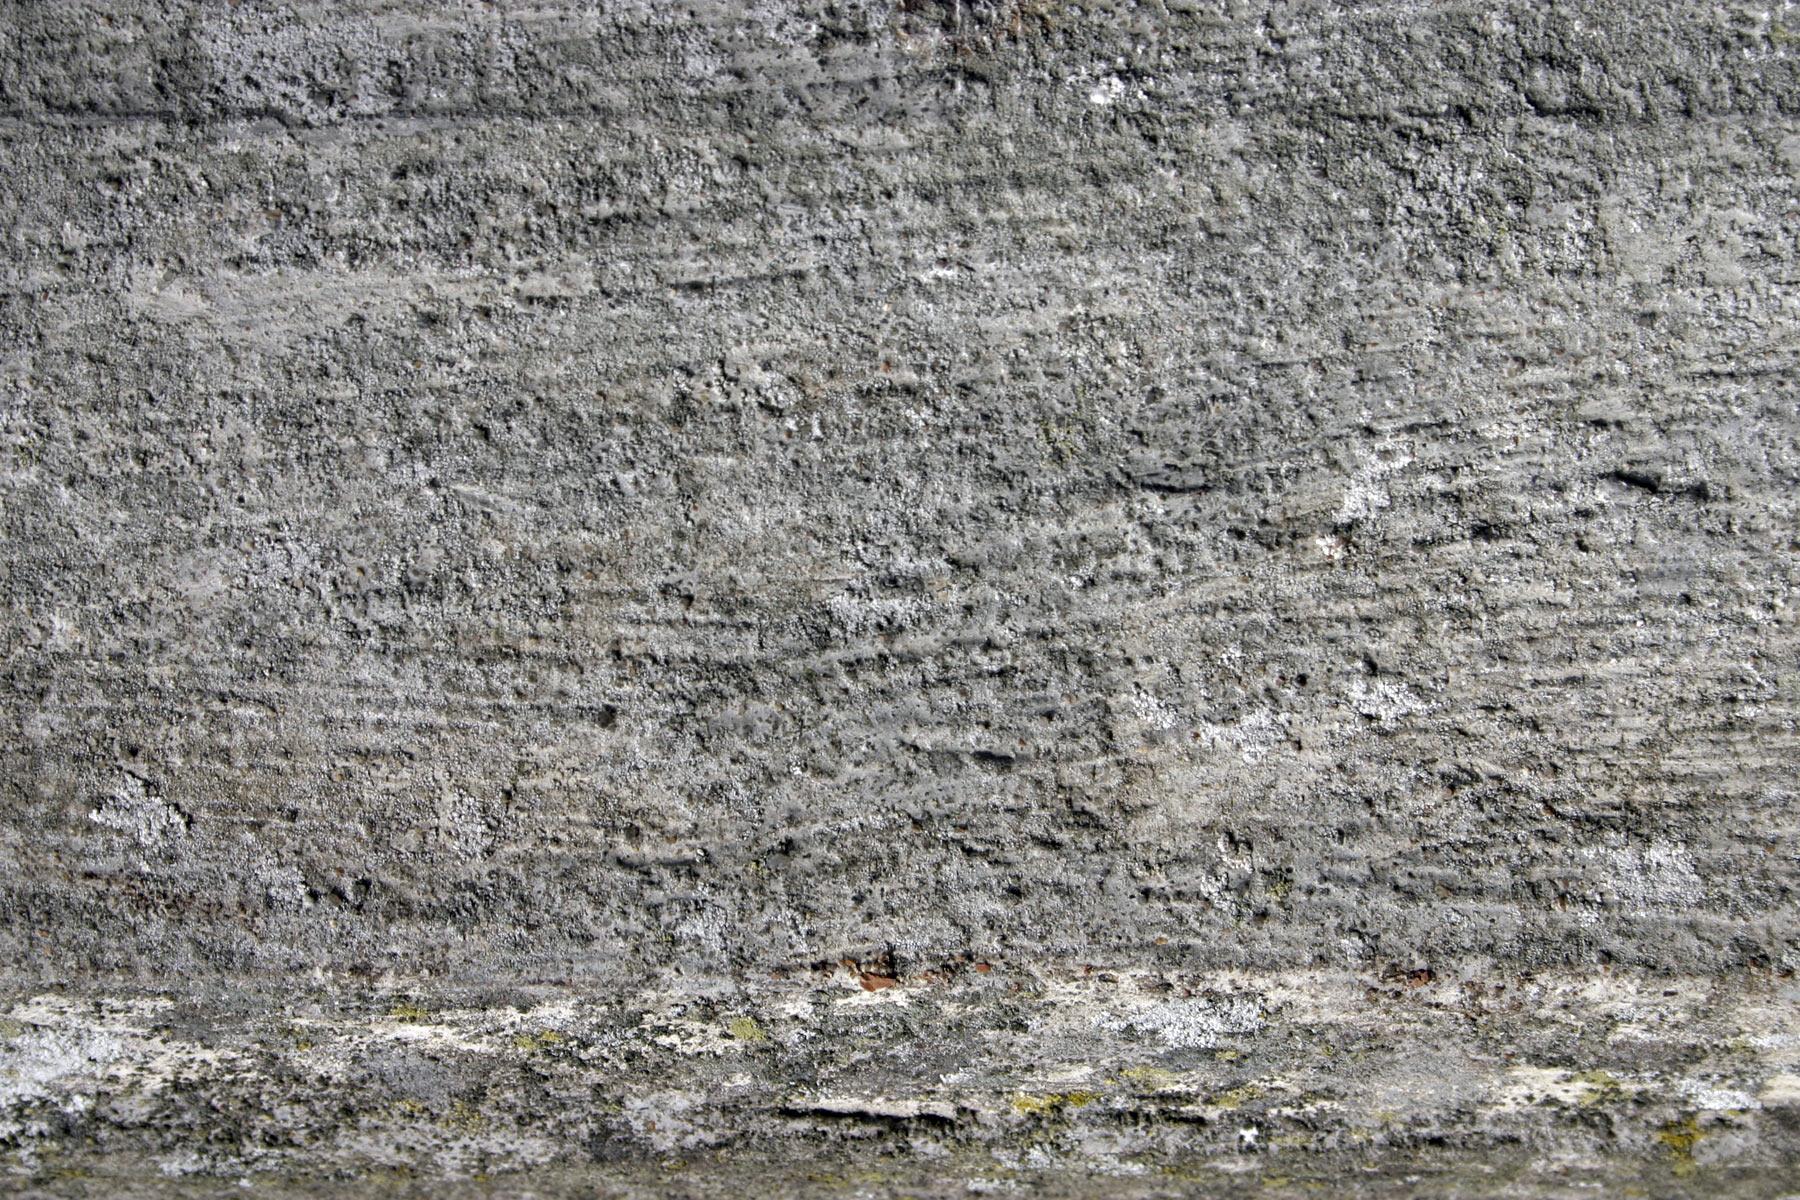 Wood texture, Bark, Cracked, Texture, Tree, HQ Photo